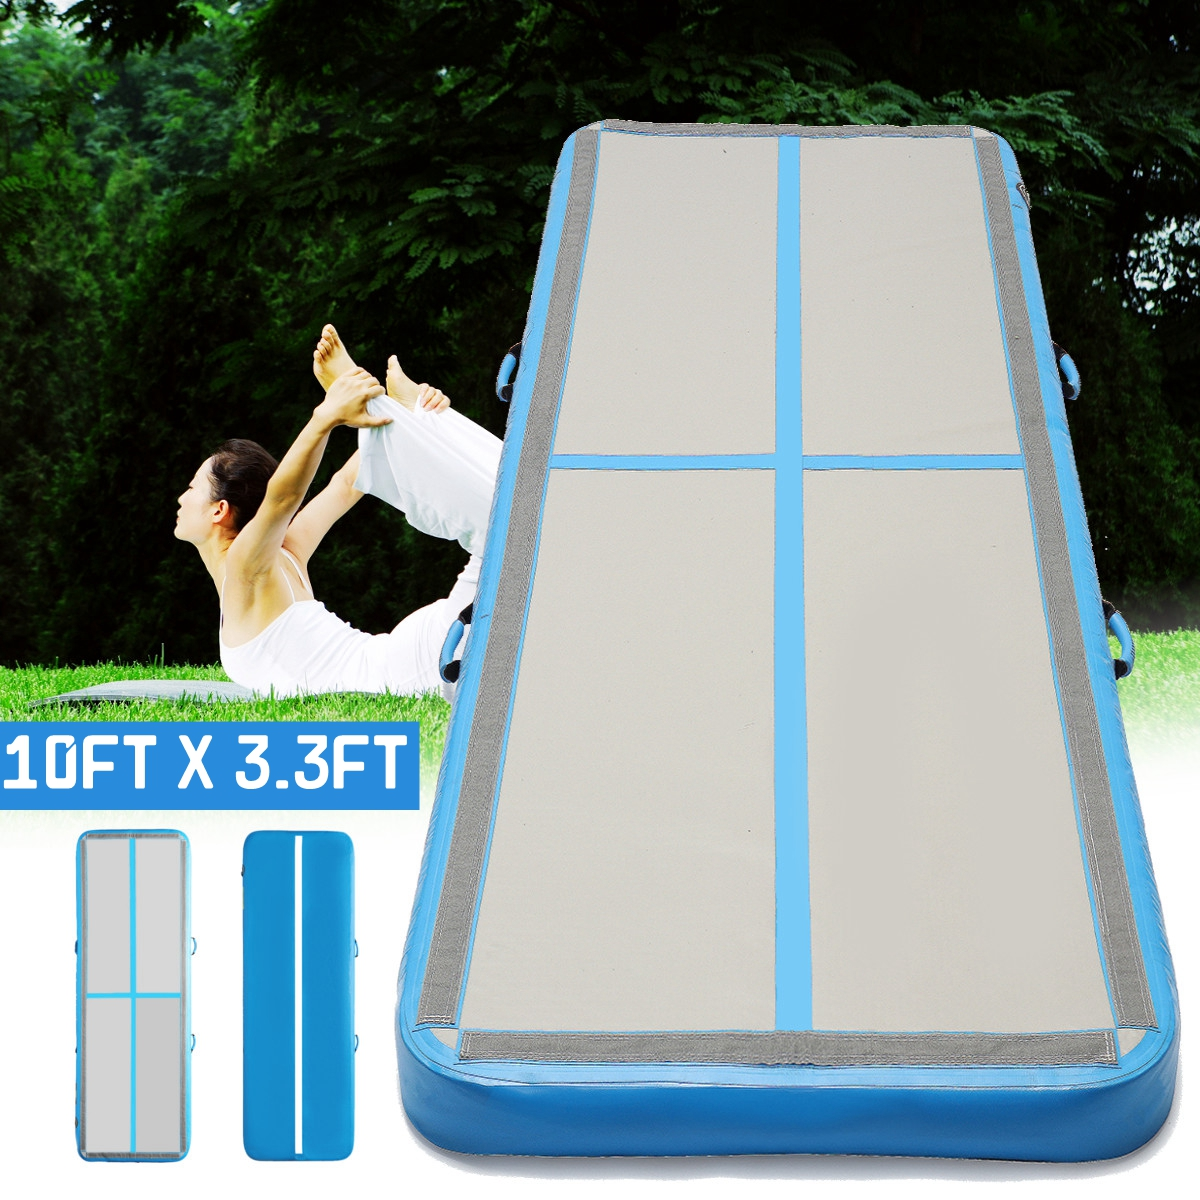 AirTrack 100x300x10cm Inflatable Cheap Gymnastics Mattress Gym Tumble Air track Floor Tumbling Air Track For Sale все цены